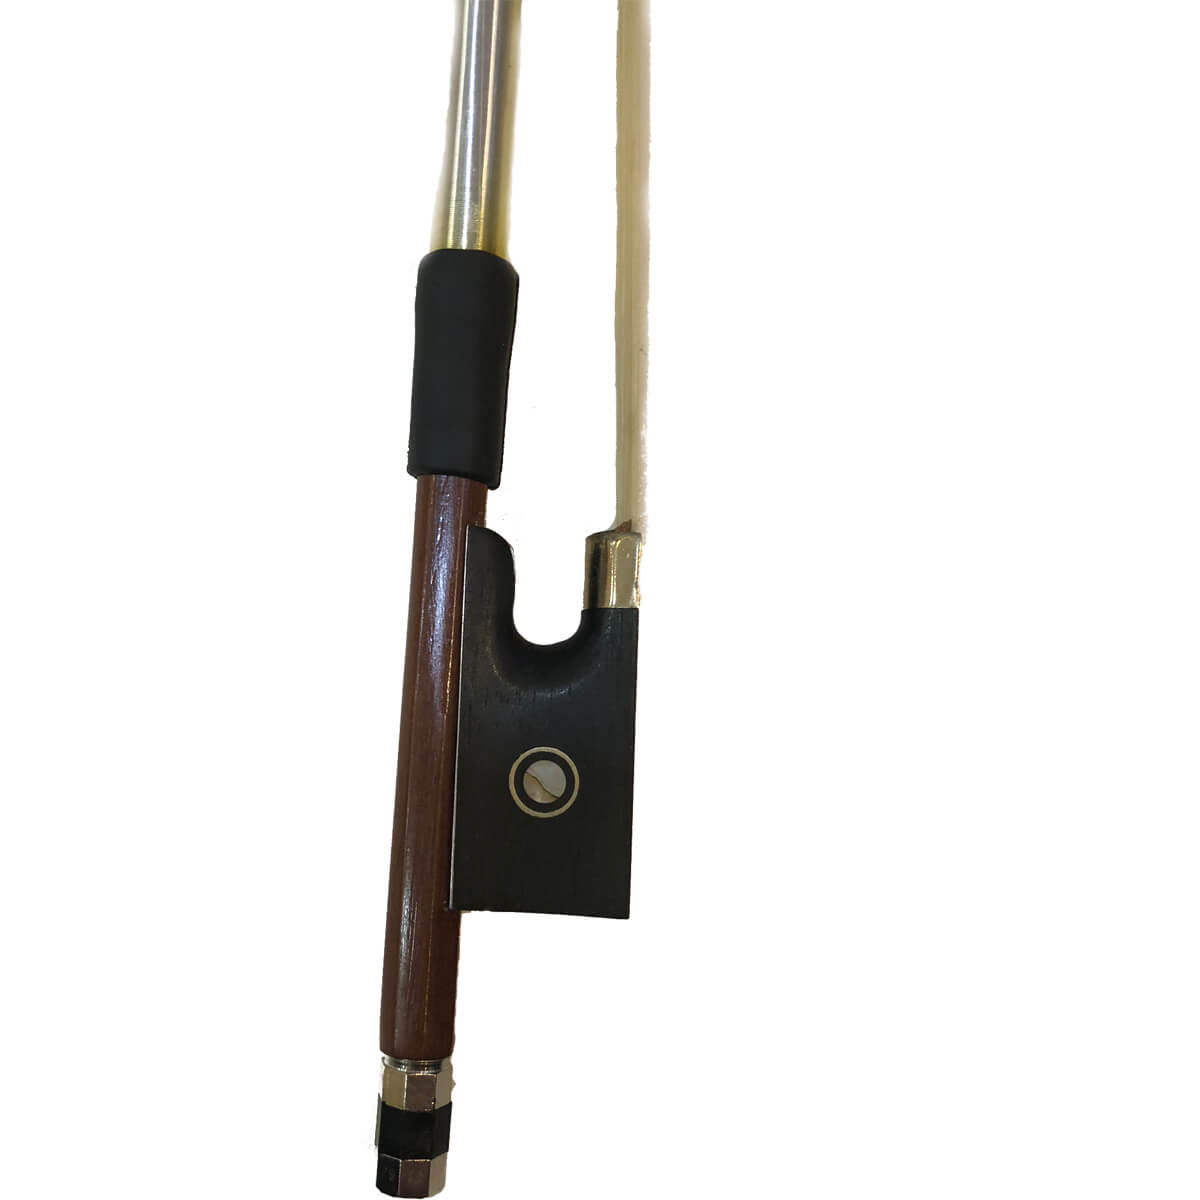 Arco Para Violino - Crina Animal - Profissional